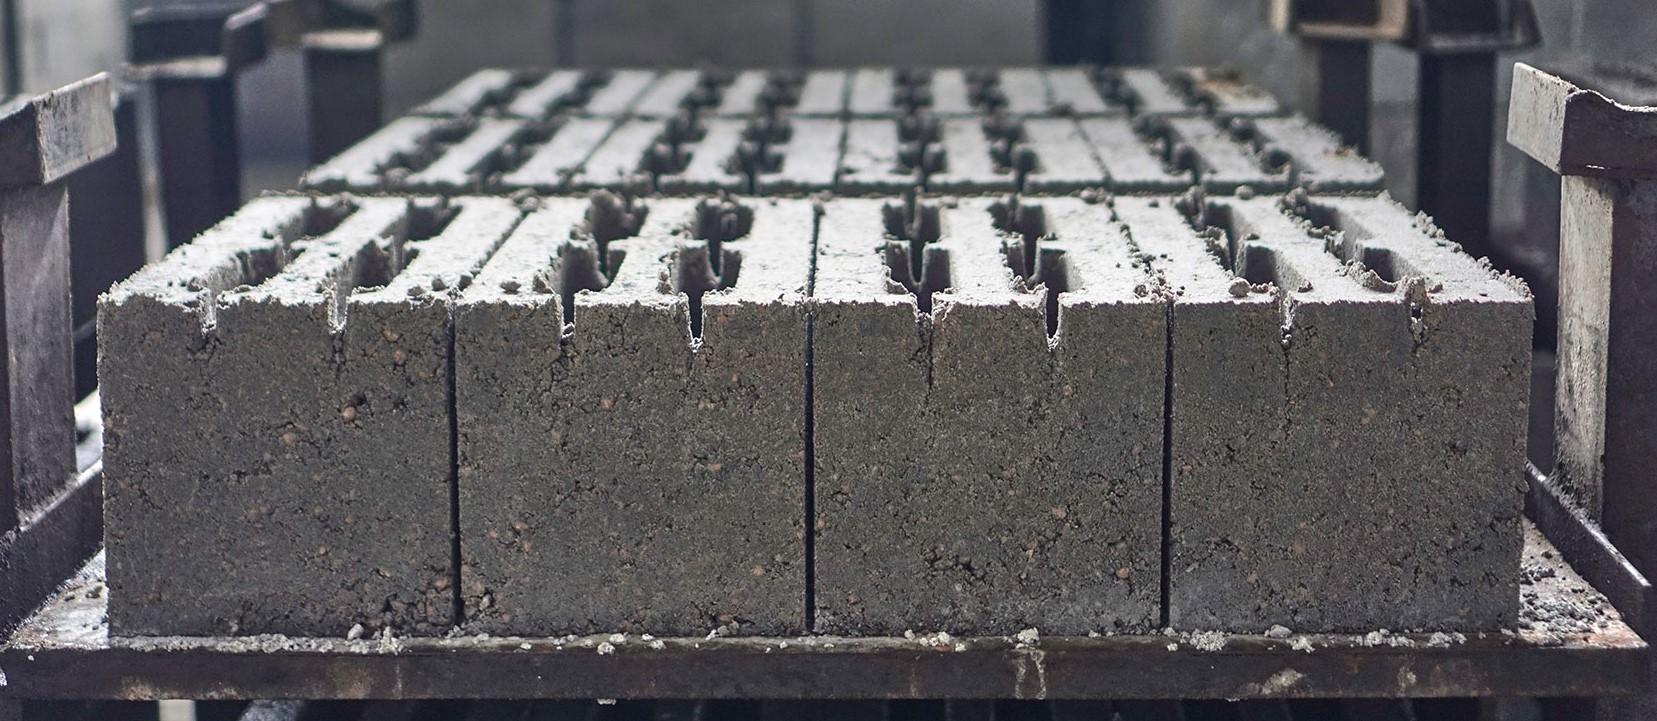 Текстура керамзитобетона панель сэндвич бетон